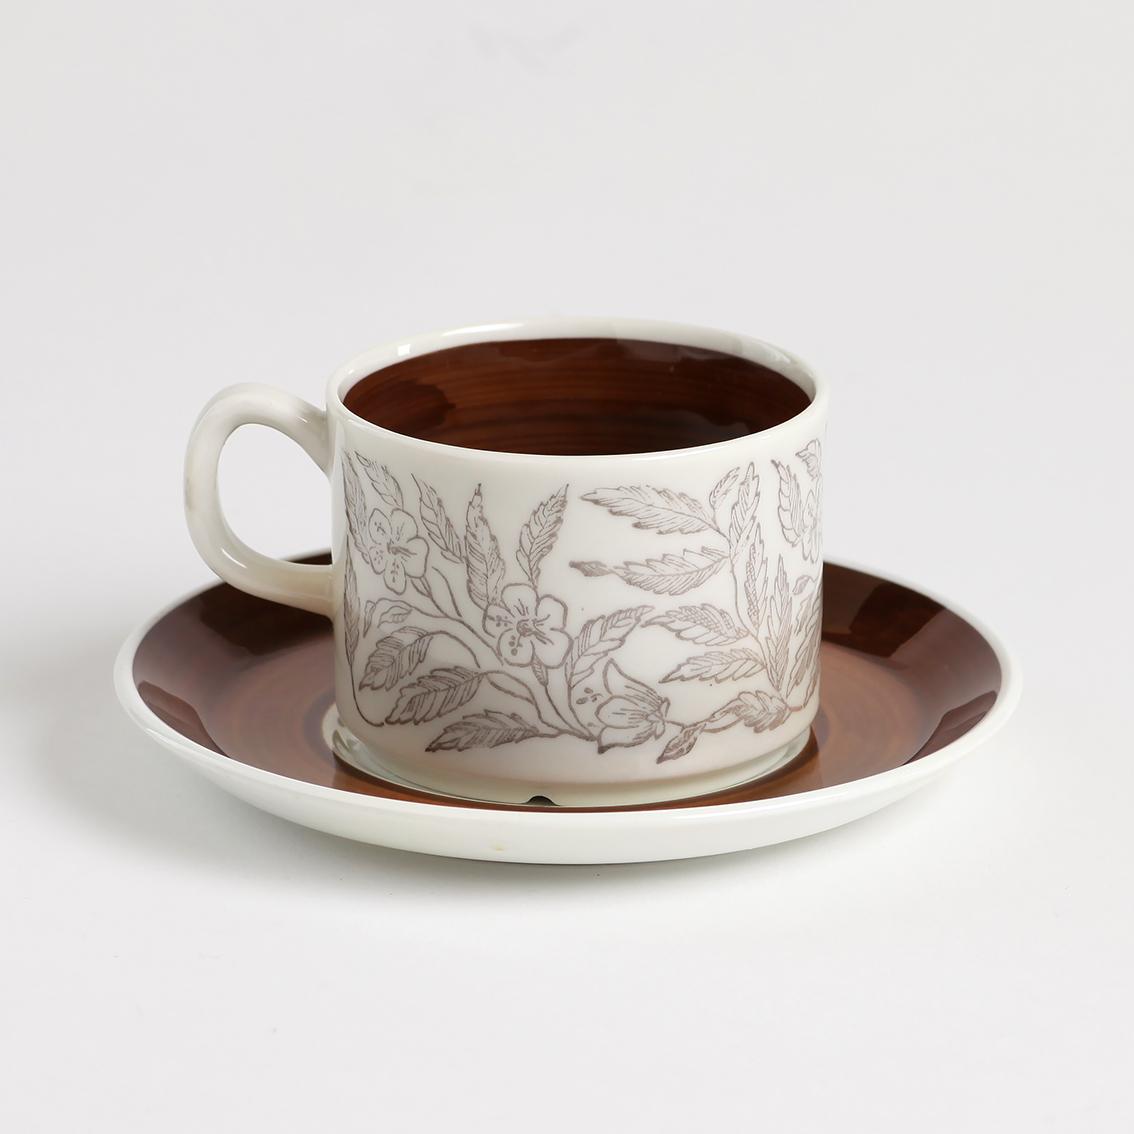 GEFLE ゲフレ Fontana フォンタナ コーヒーカップ&ソーサー - 4 北欧ヴィンテージ